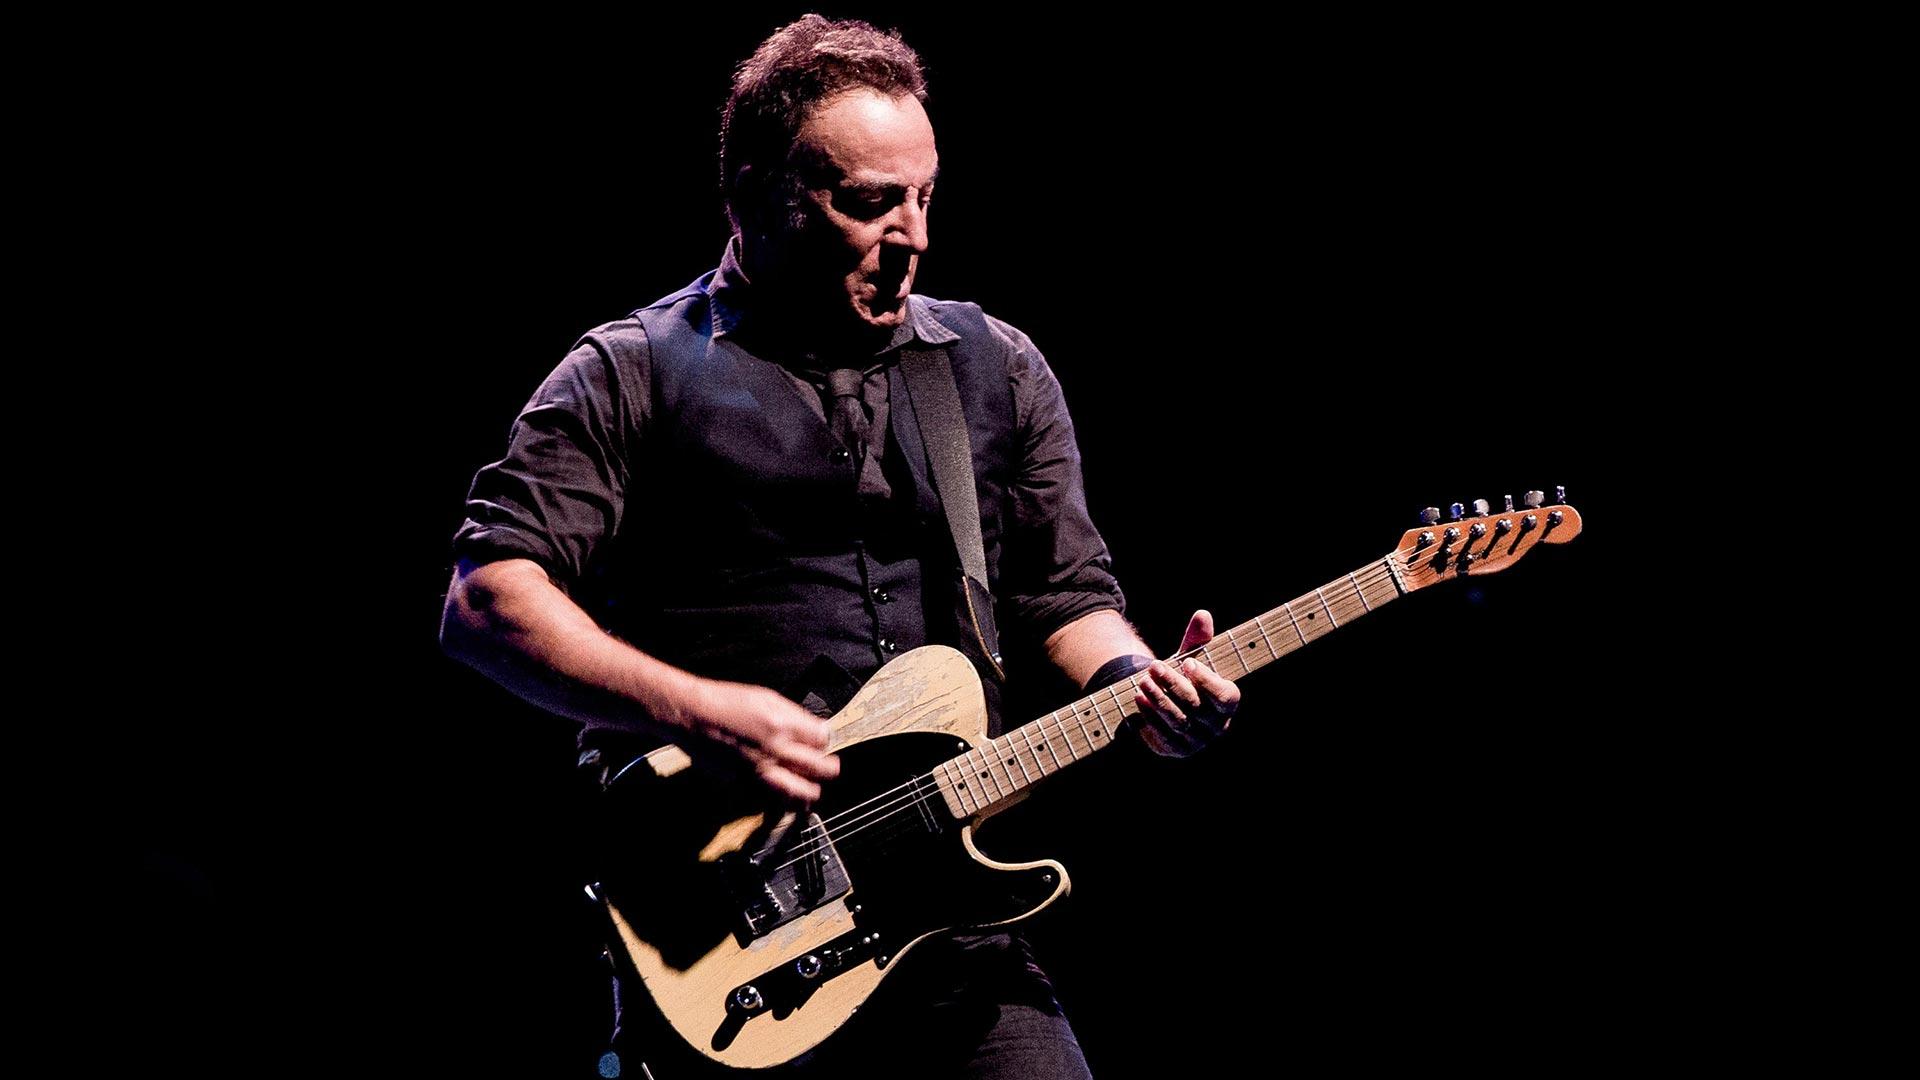 Bruce Springsteen 1:5